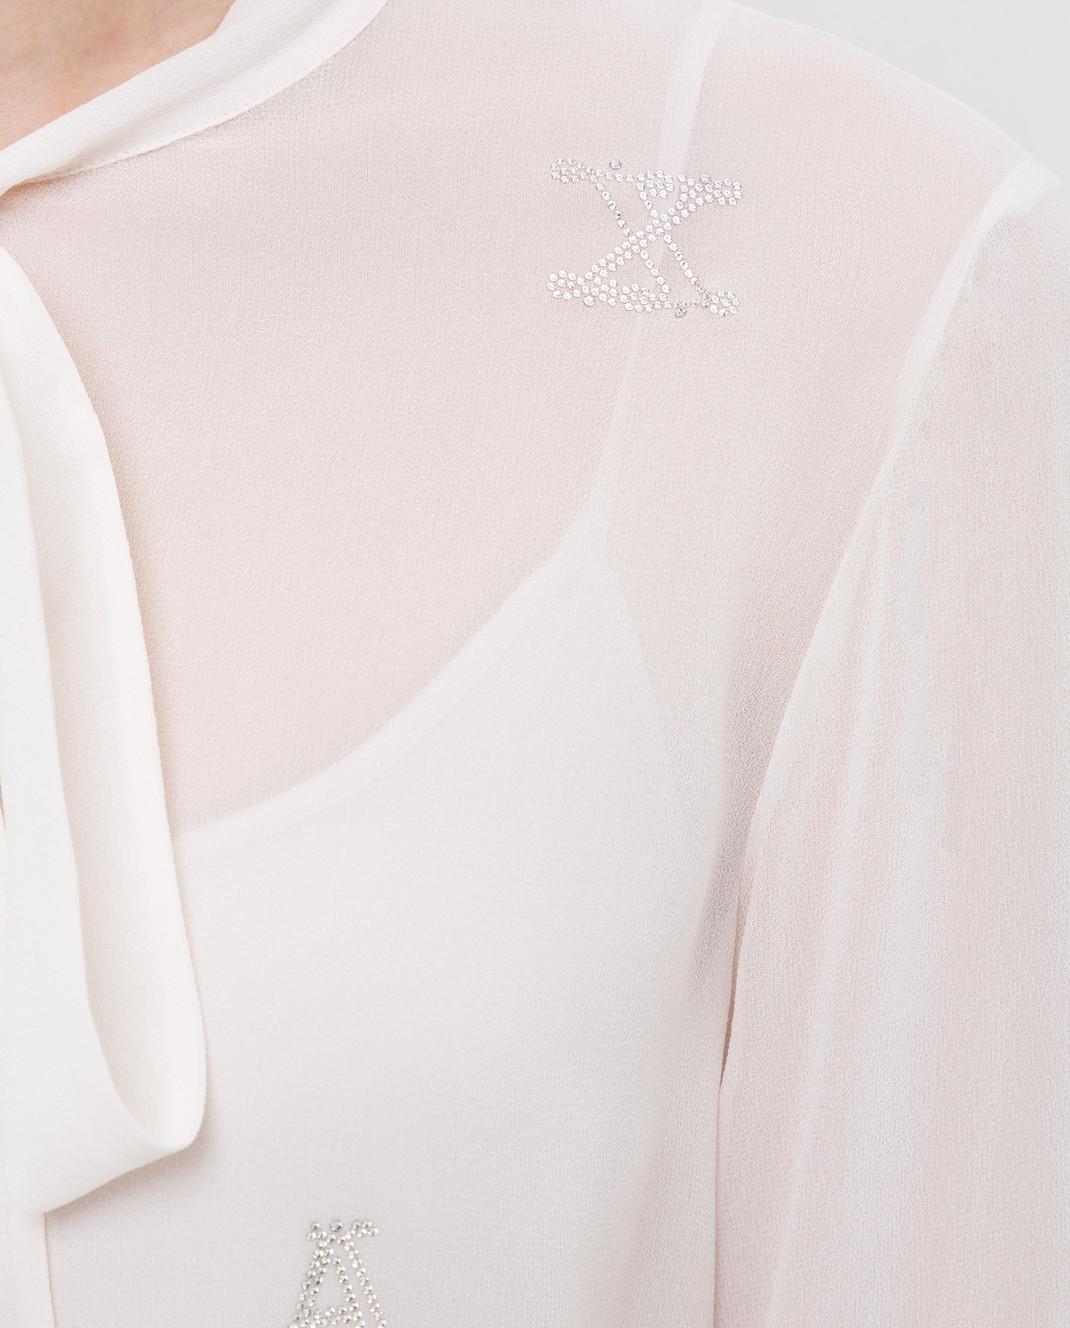 Max Mara Светло-бежевая блуза из шелка изображение 5